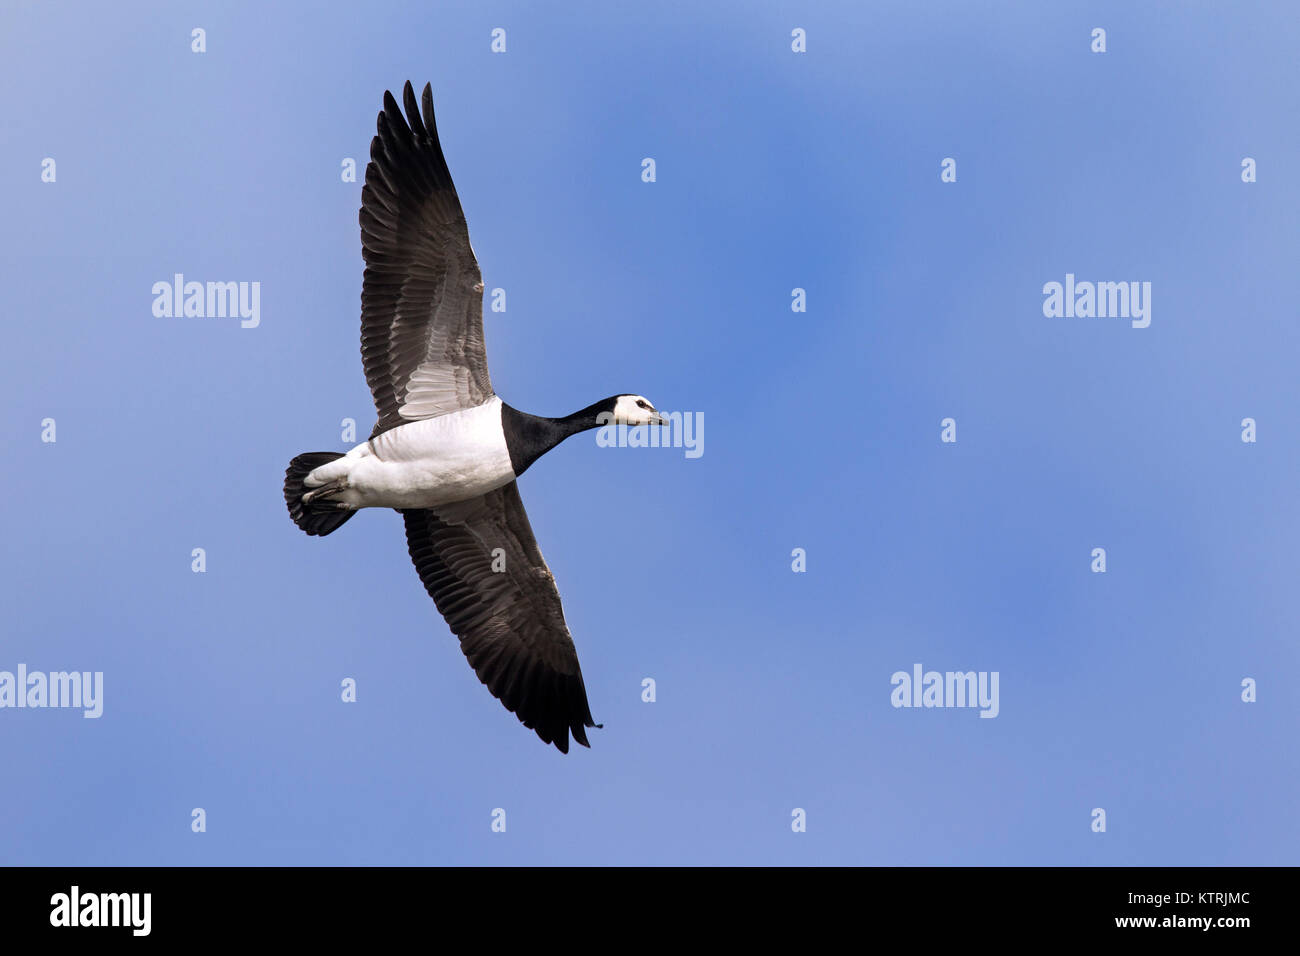 Barnacle goose (Branta leucopsis) in flight against blue sky - Stock Image